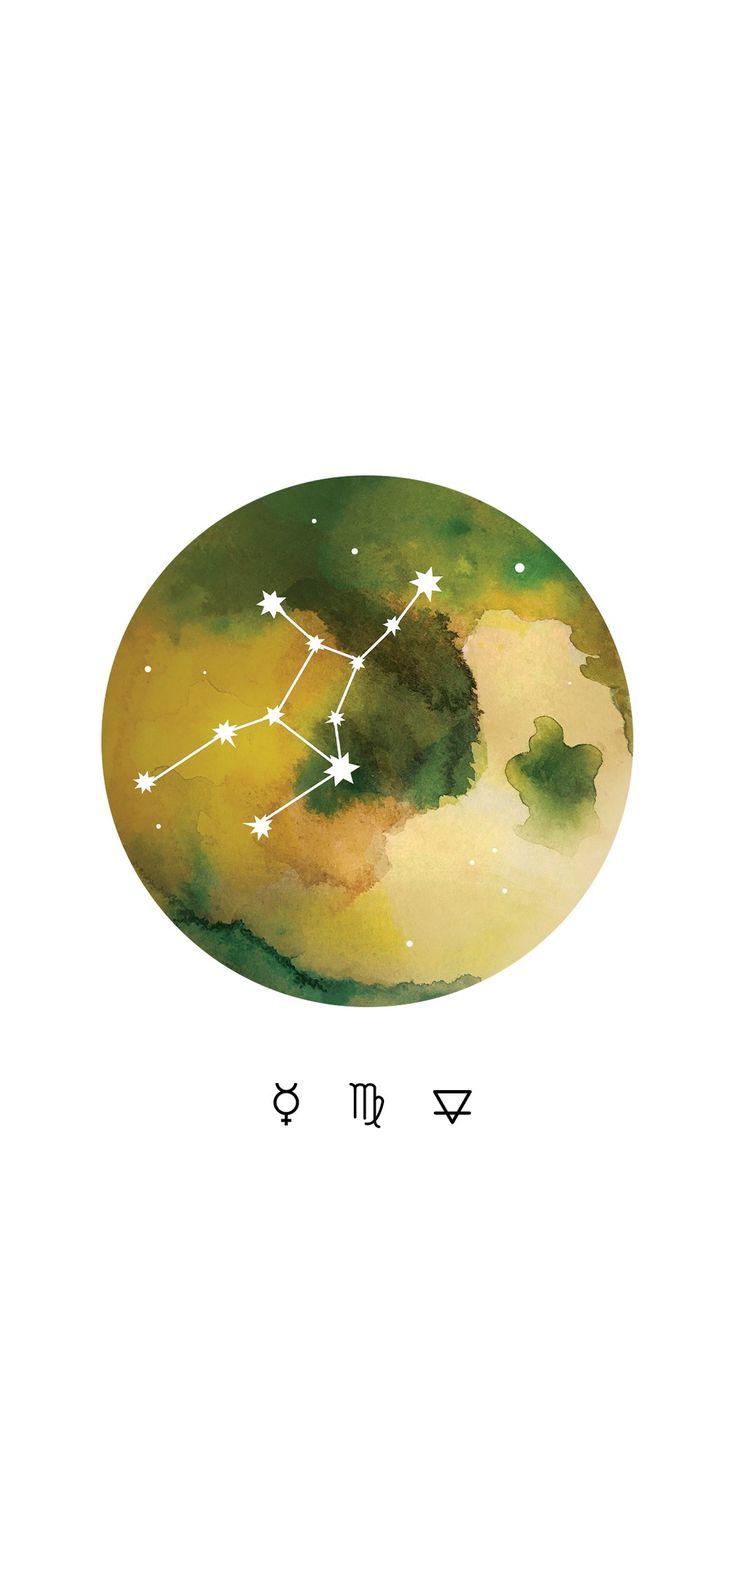 Virgo Memes, Virgo Moon, Zodiac Tattoos, Virgo Zodiac, Heart Sign, New Moon, Full Moon, Find Image, Horoscopes